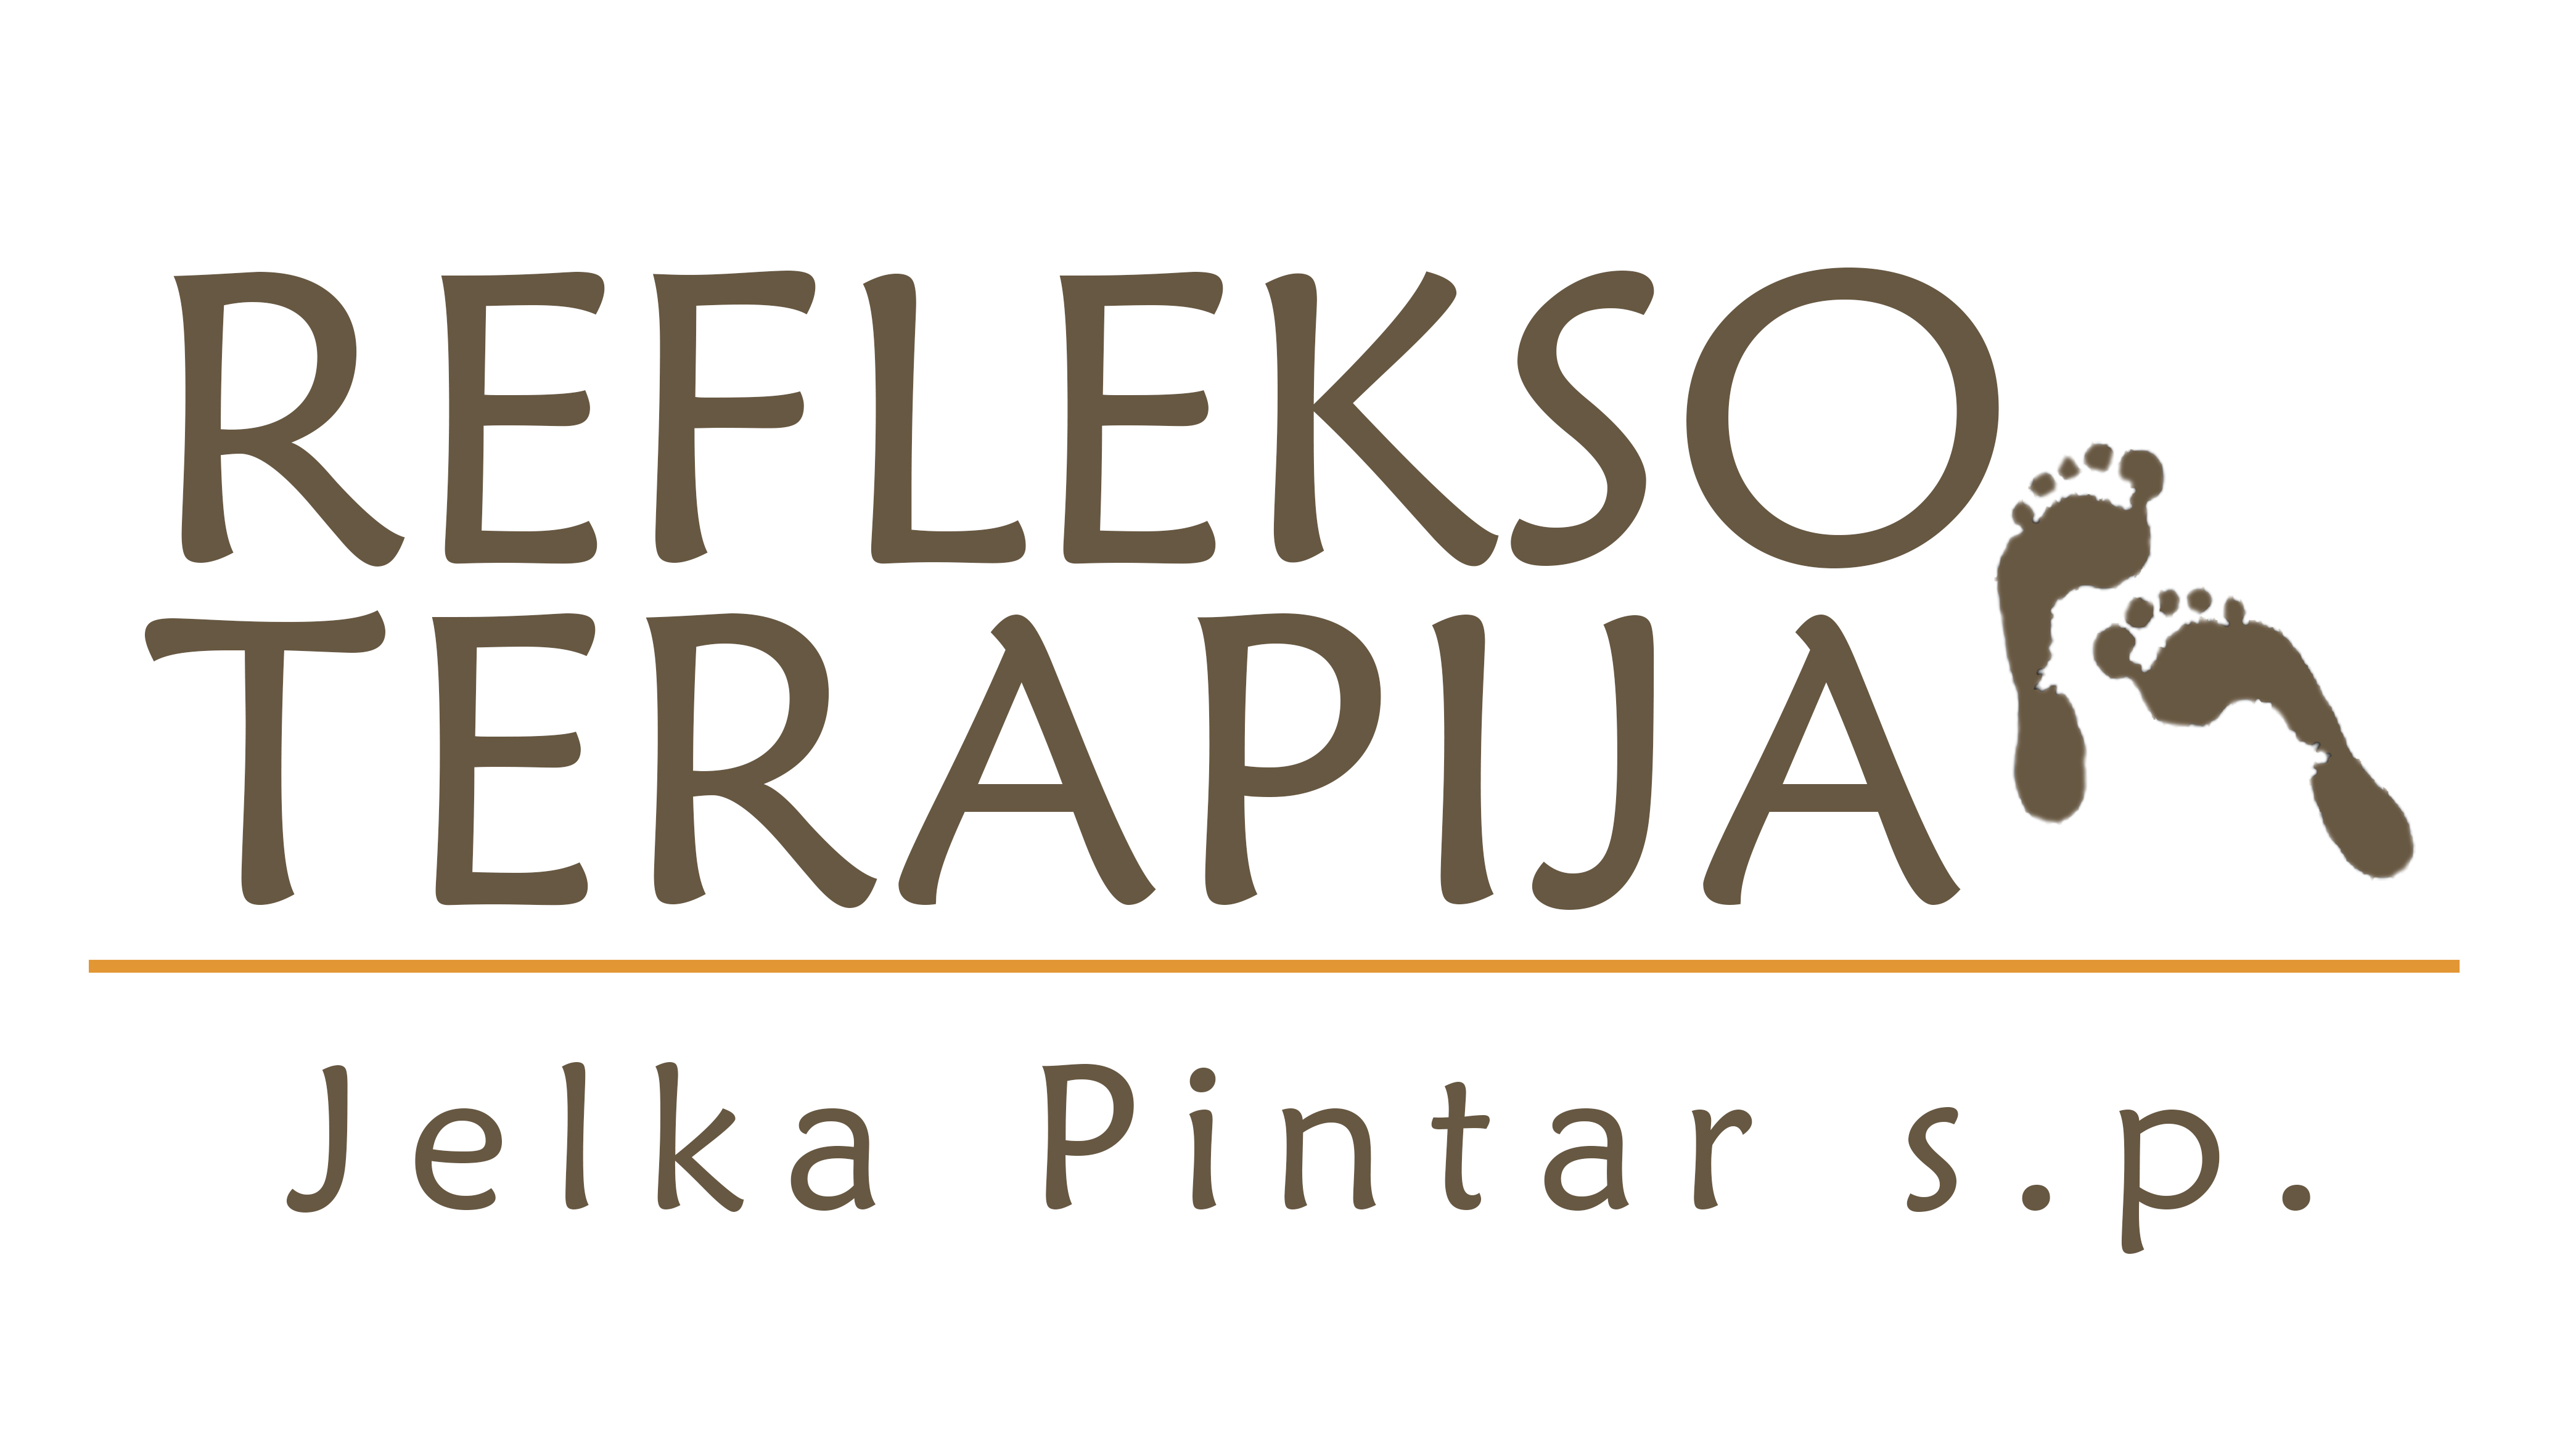 Refleksoterapija Jelka Pintar s.p.